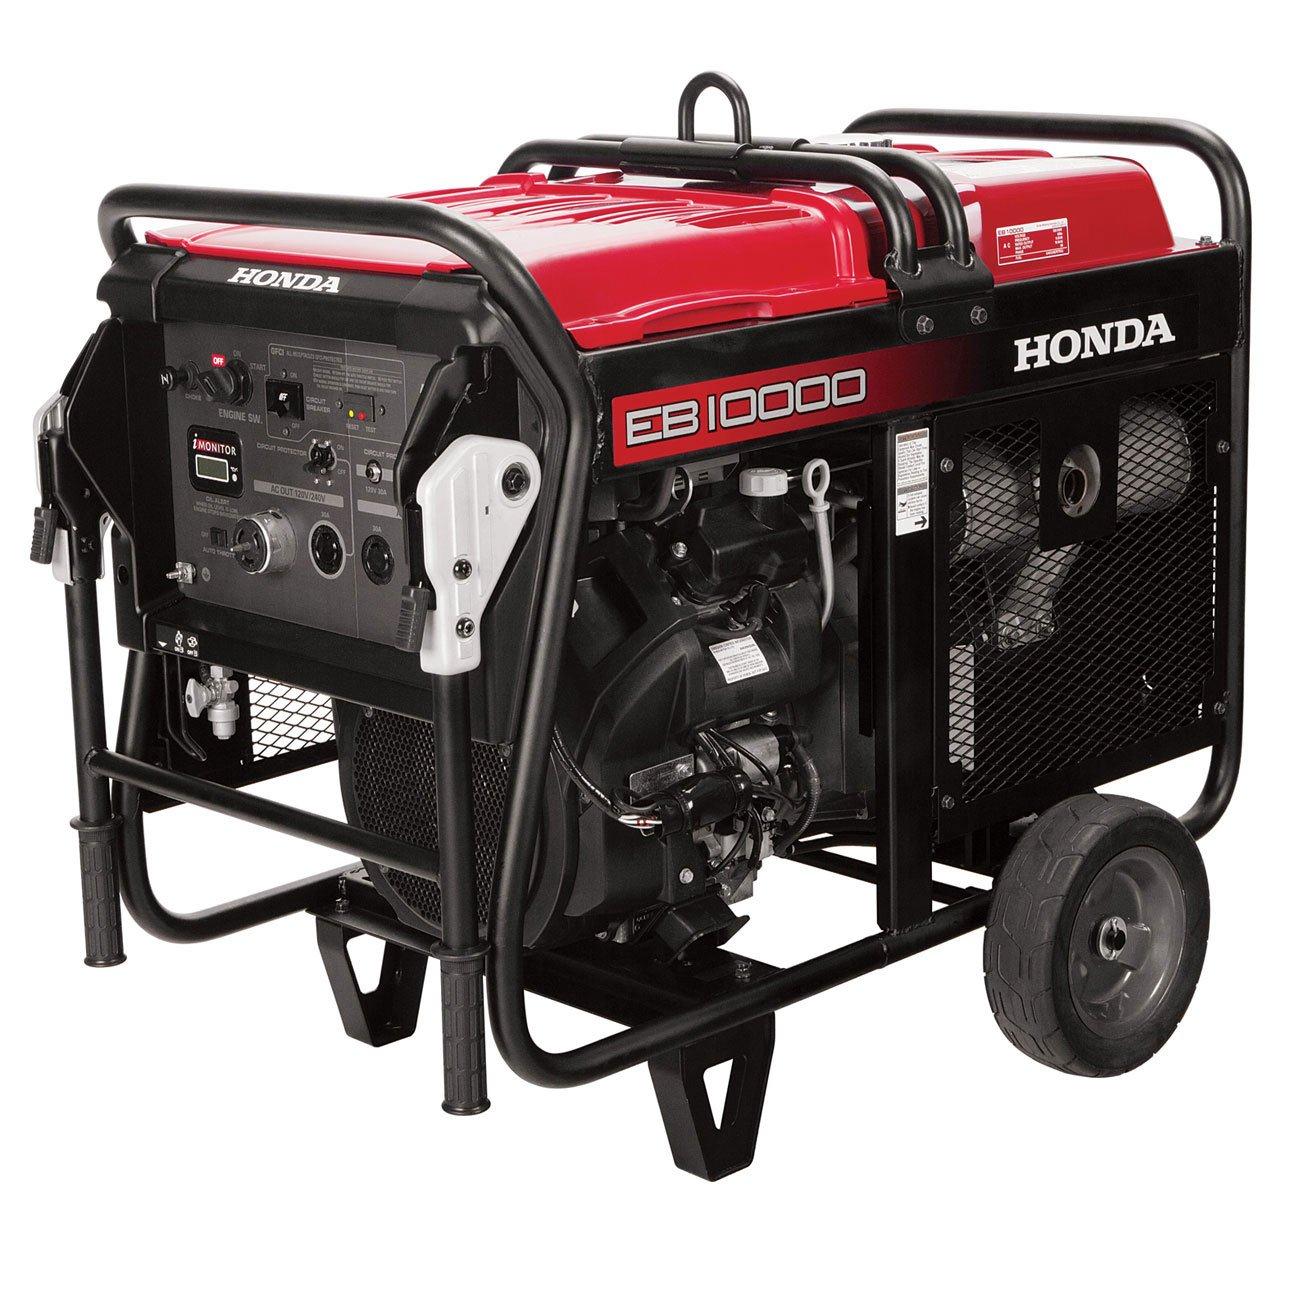 Honda 11000 Watt Generator Eb11000 Wiring Diagram Eb Industrial Power Generators Garden Outdoor 1300x1300